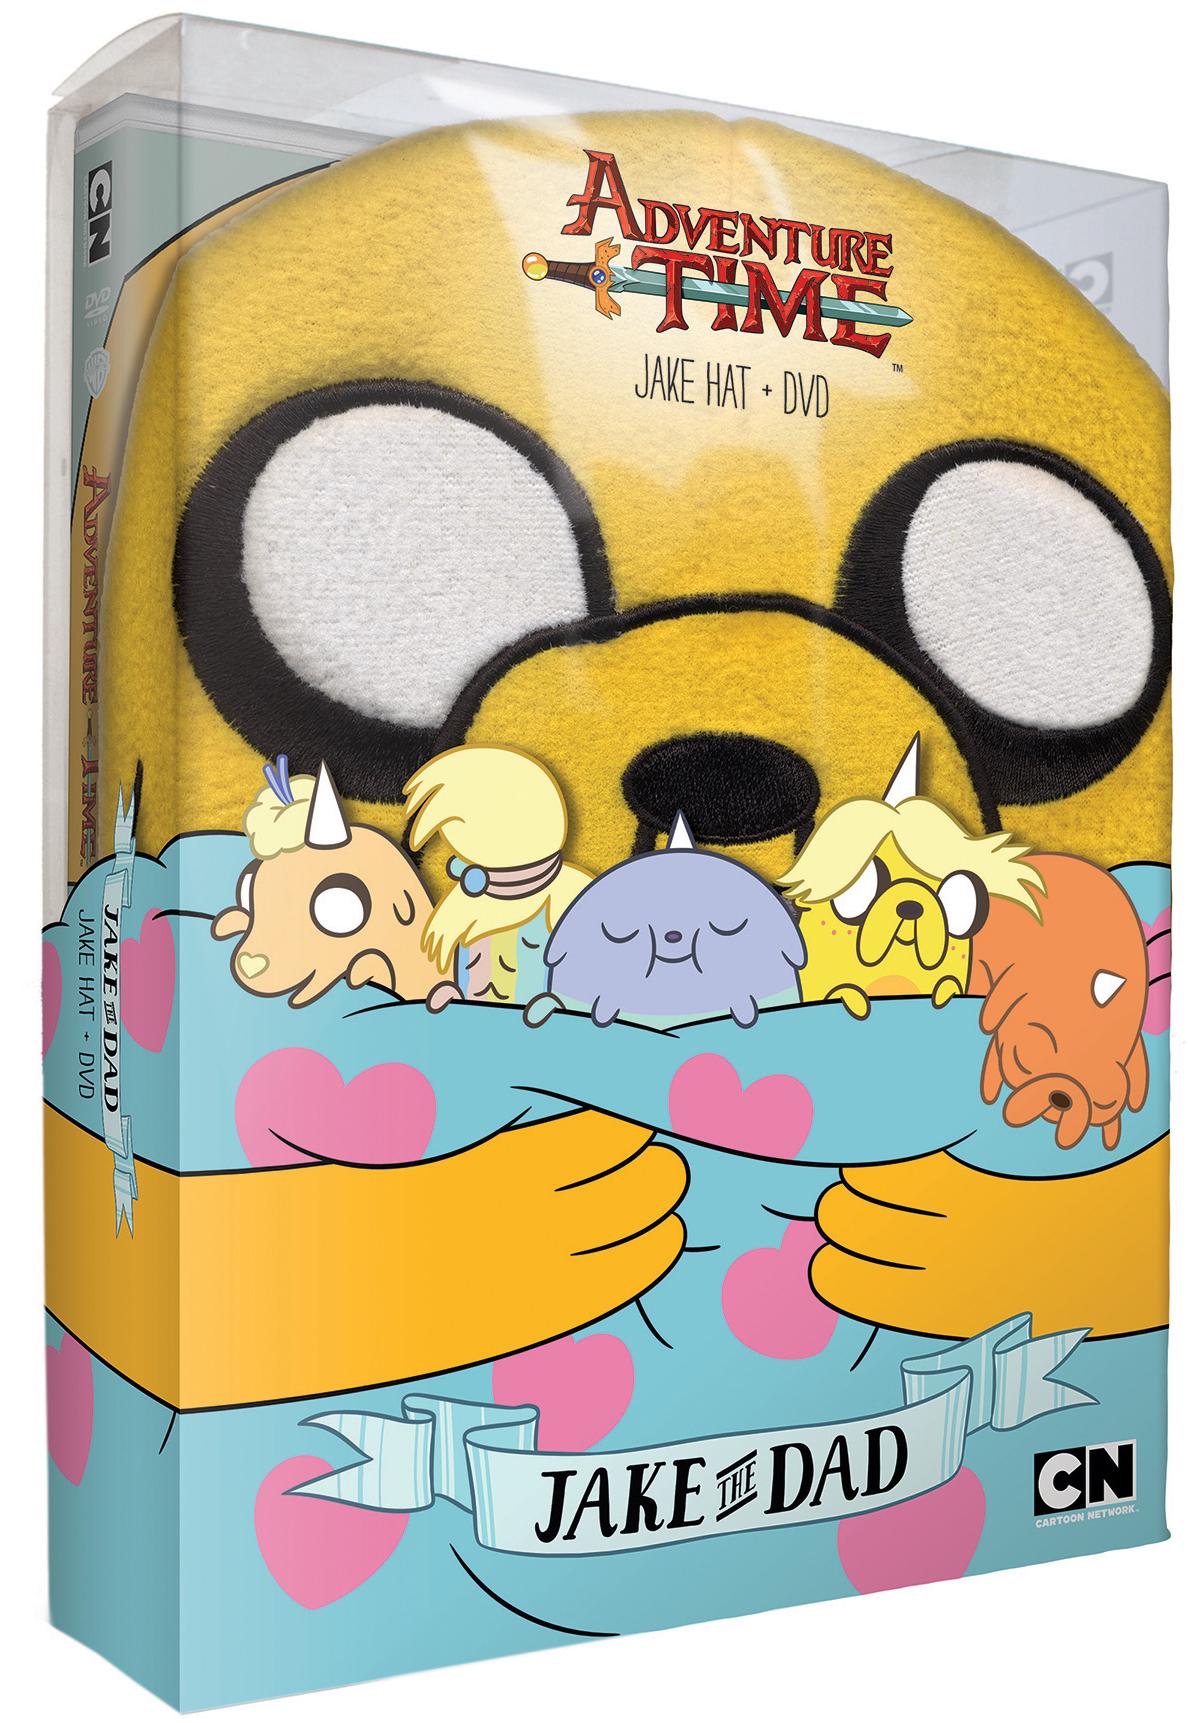 AdventureTimeJakeTheDad_DVDGiftSet_CoverArt